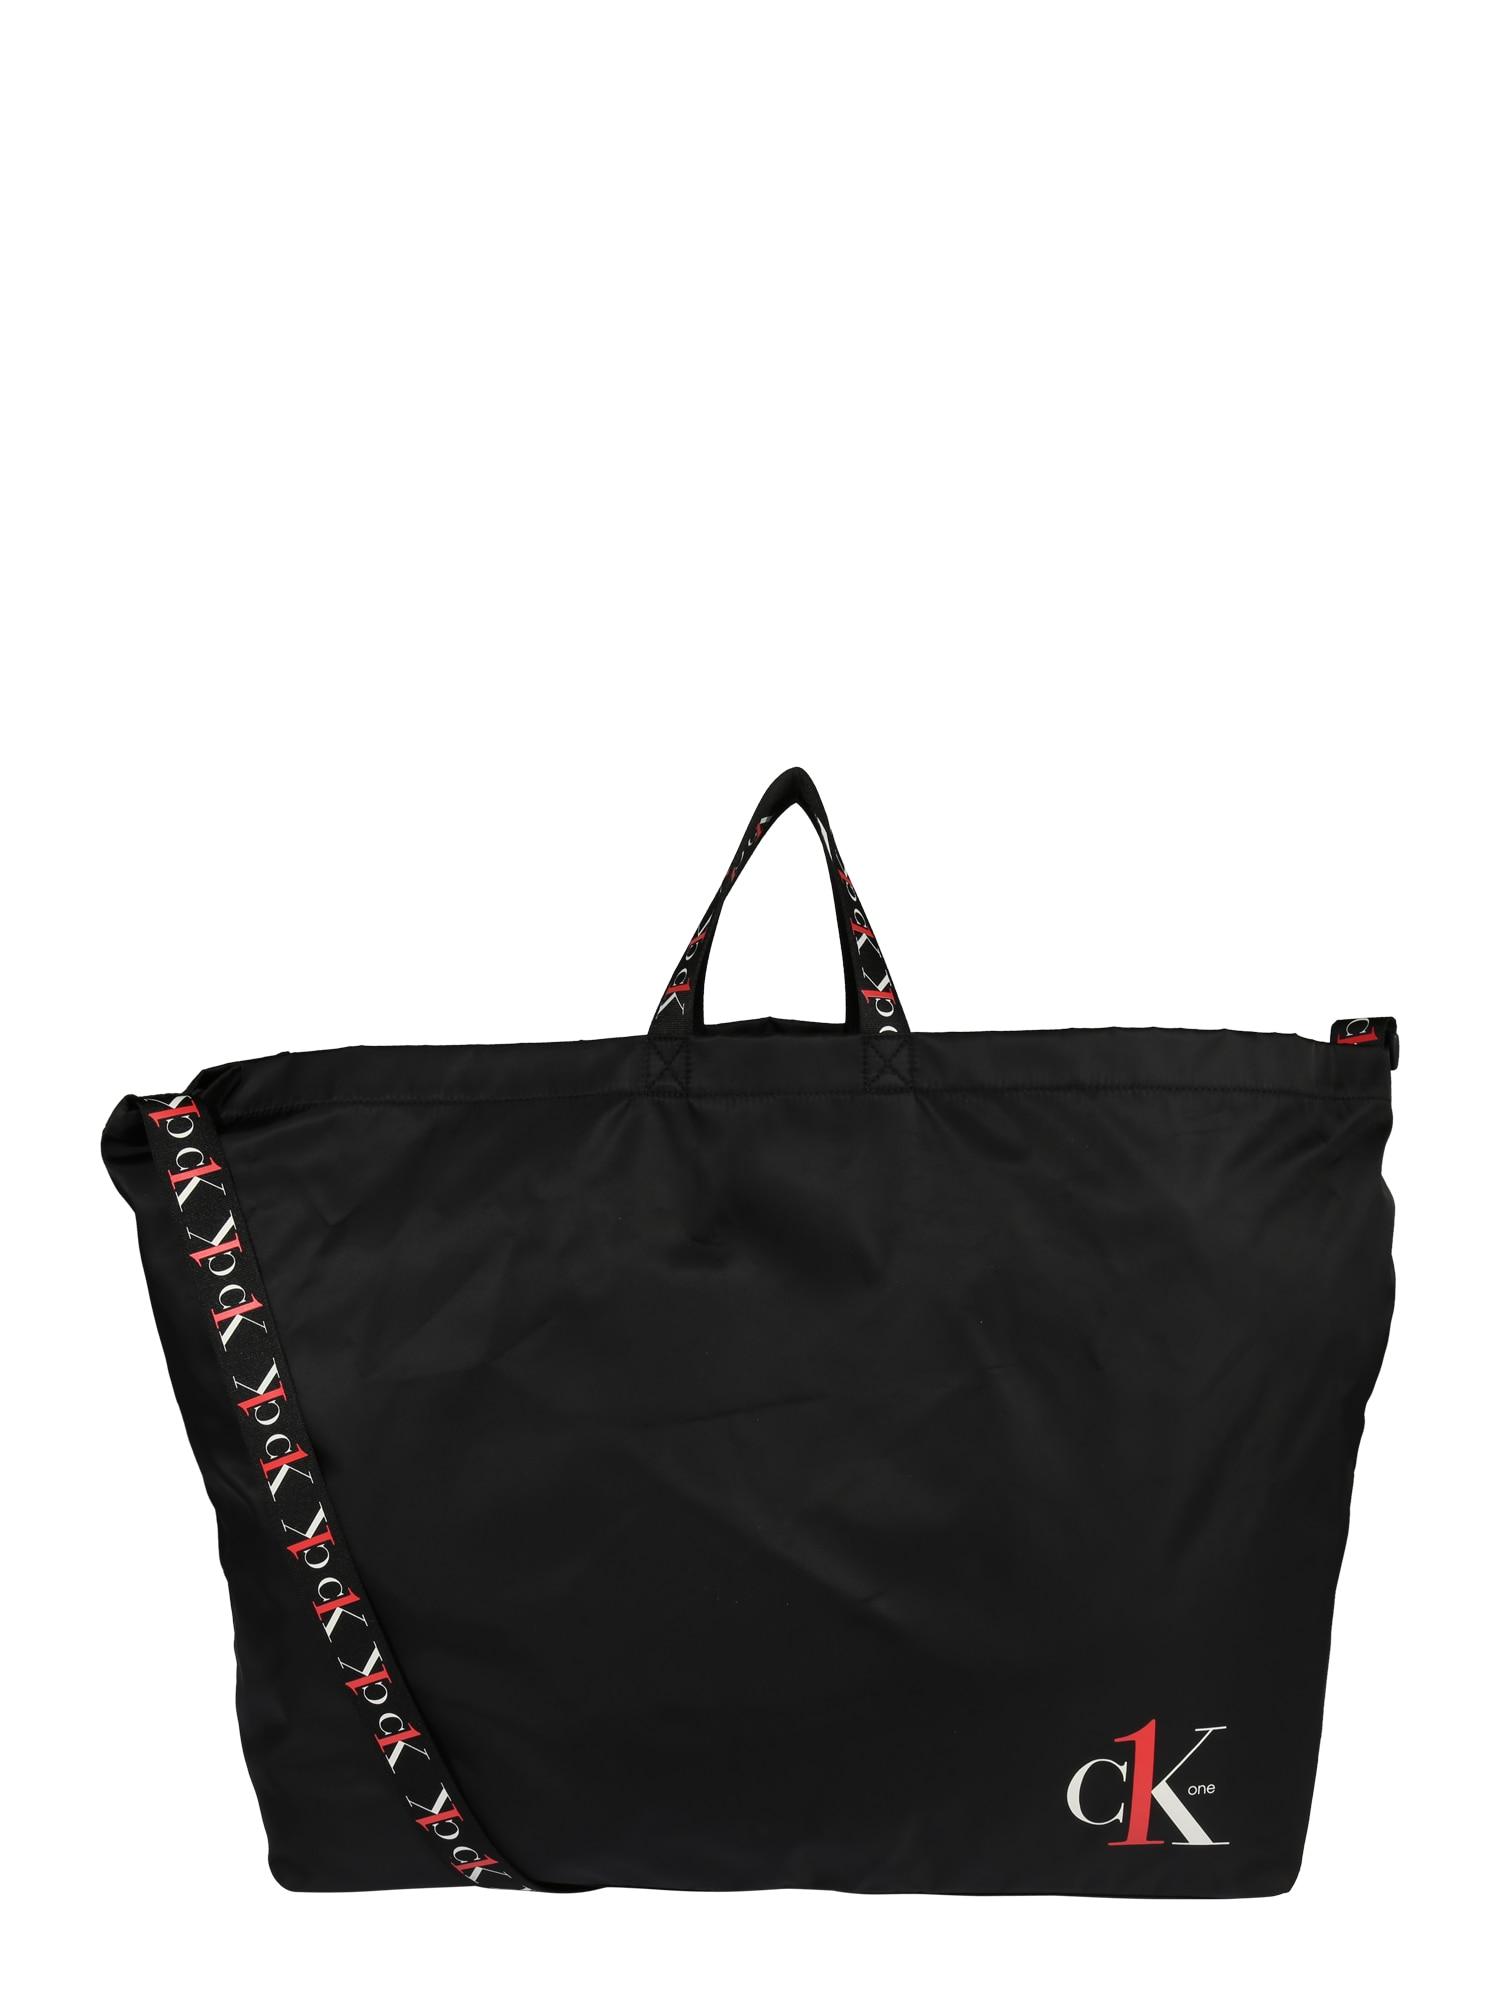 Calvin Klein Jeans Pirkinių krepšys 'CK1 XL SHOPPER TAPEALLOVER' balta / juoda / raudona